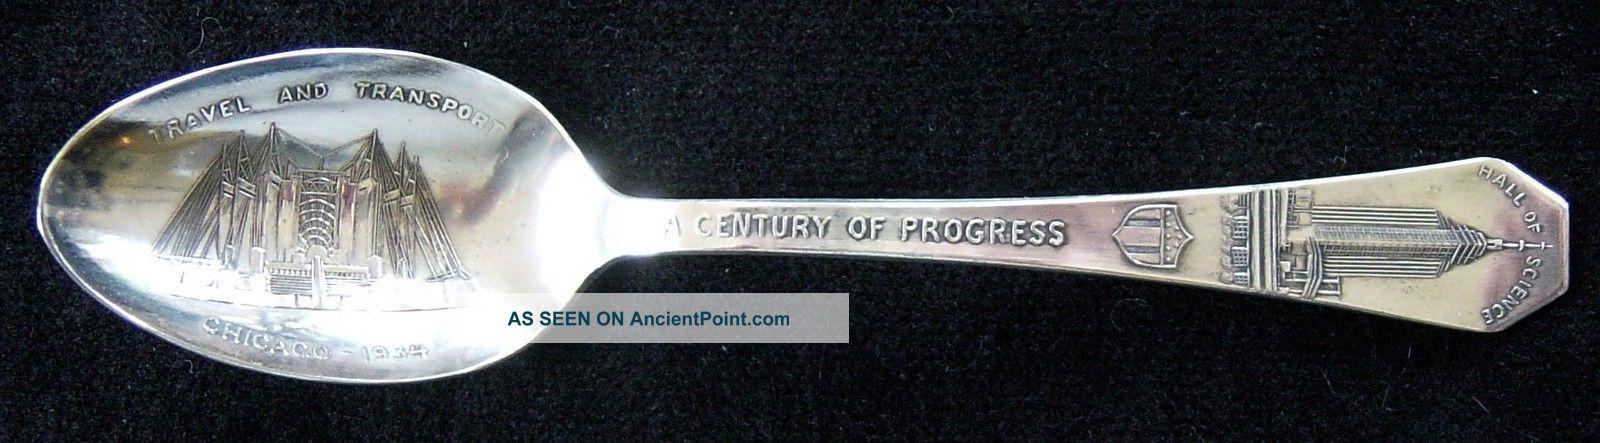 1934 Chicago World ' S Fair Themed Souvenir Silverplated Spoon Souvenir Spoons photo